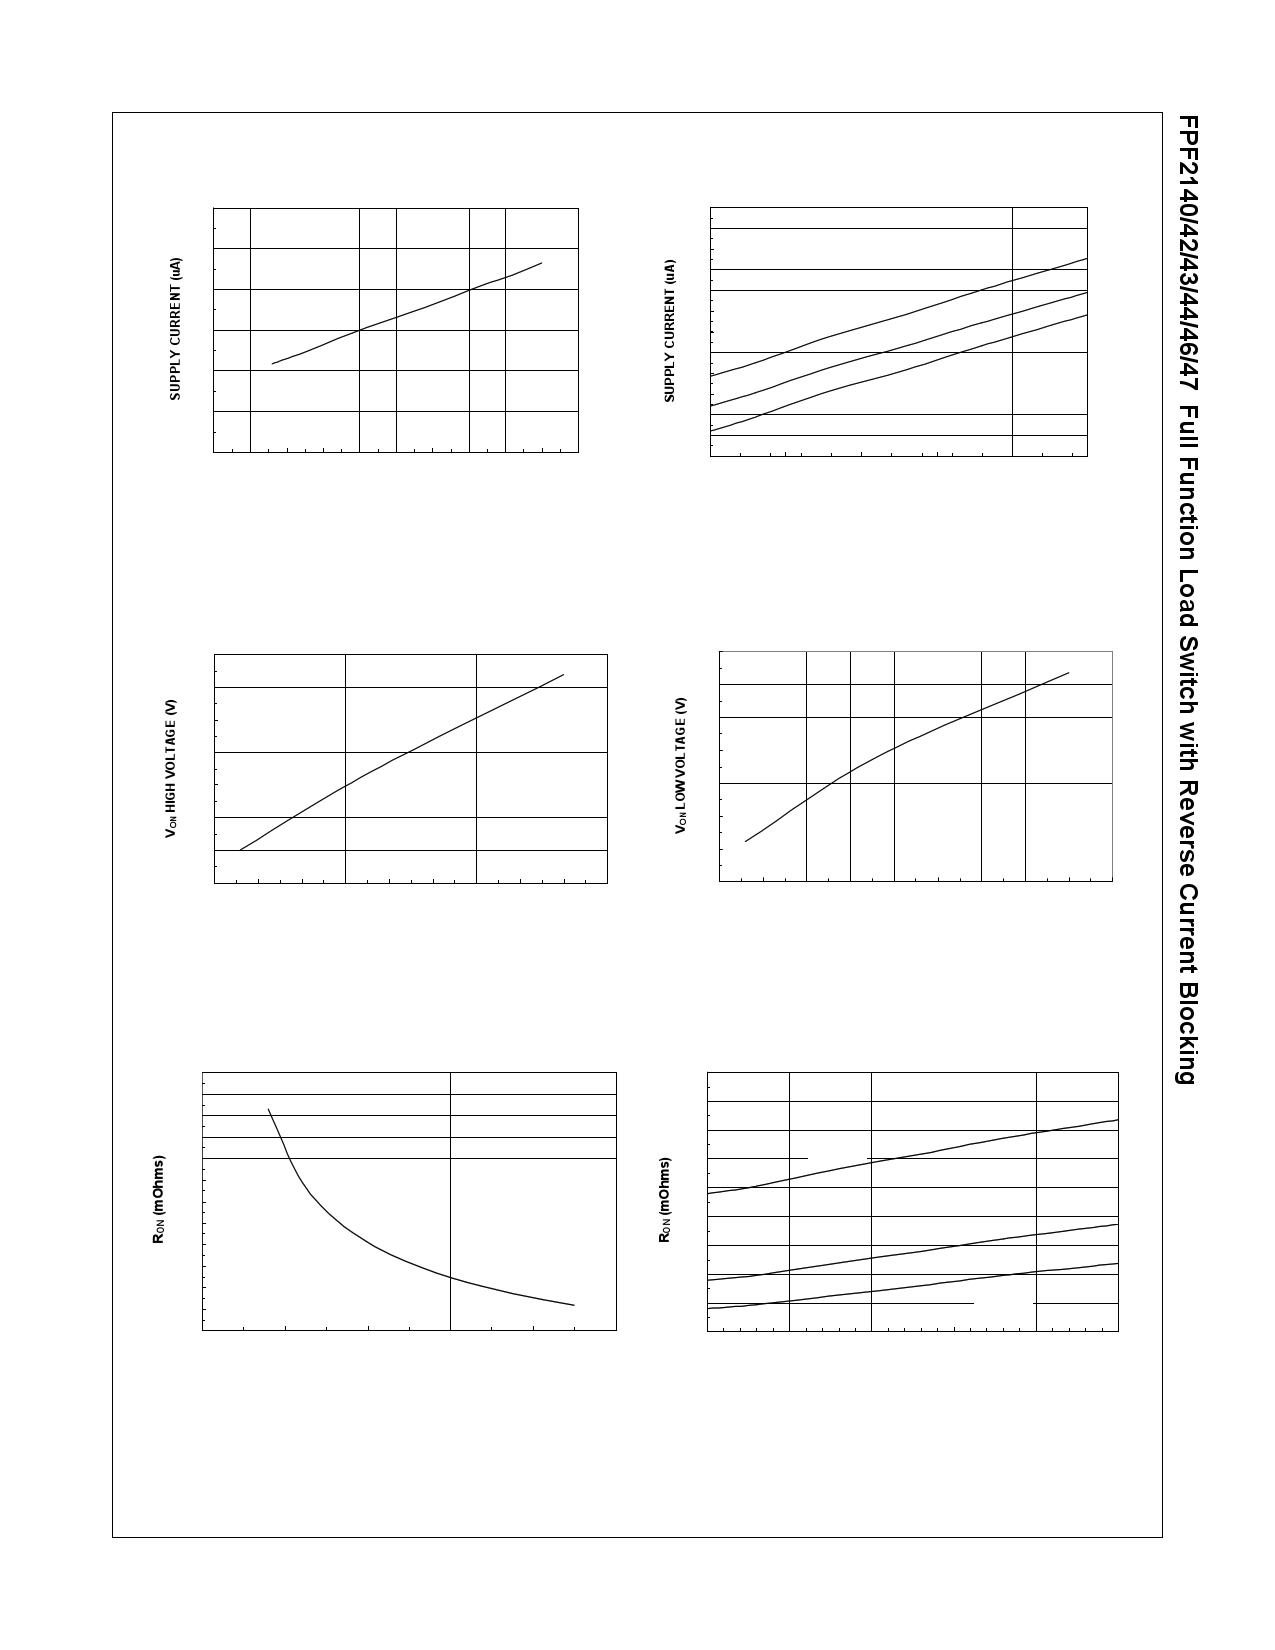 FPF2144 pdf, arduino